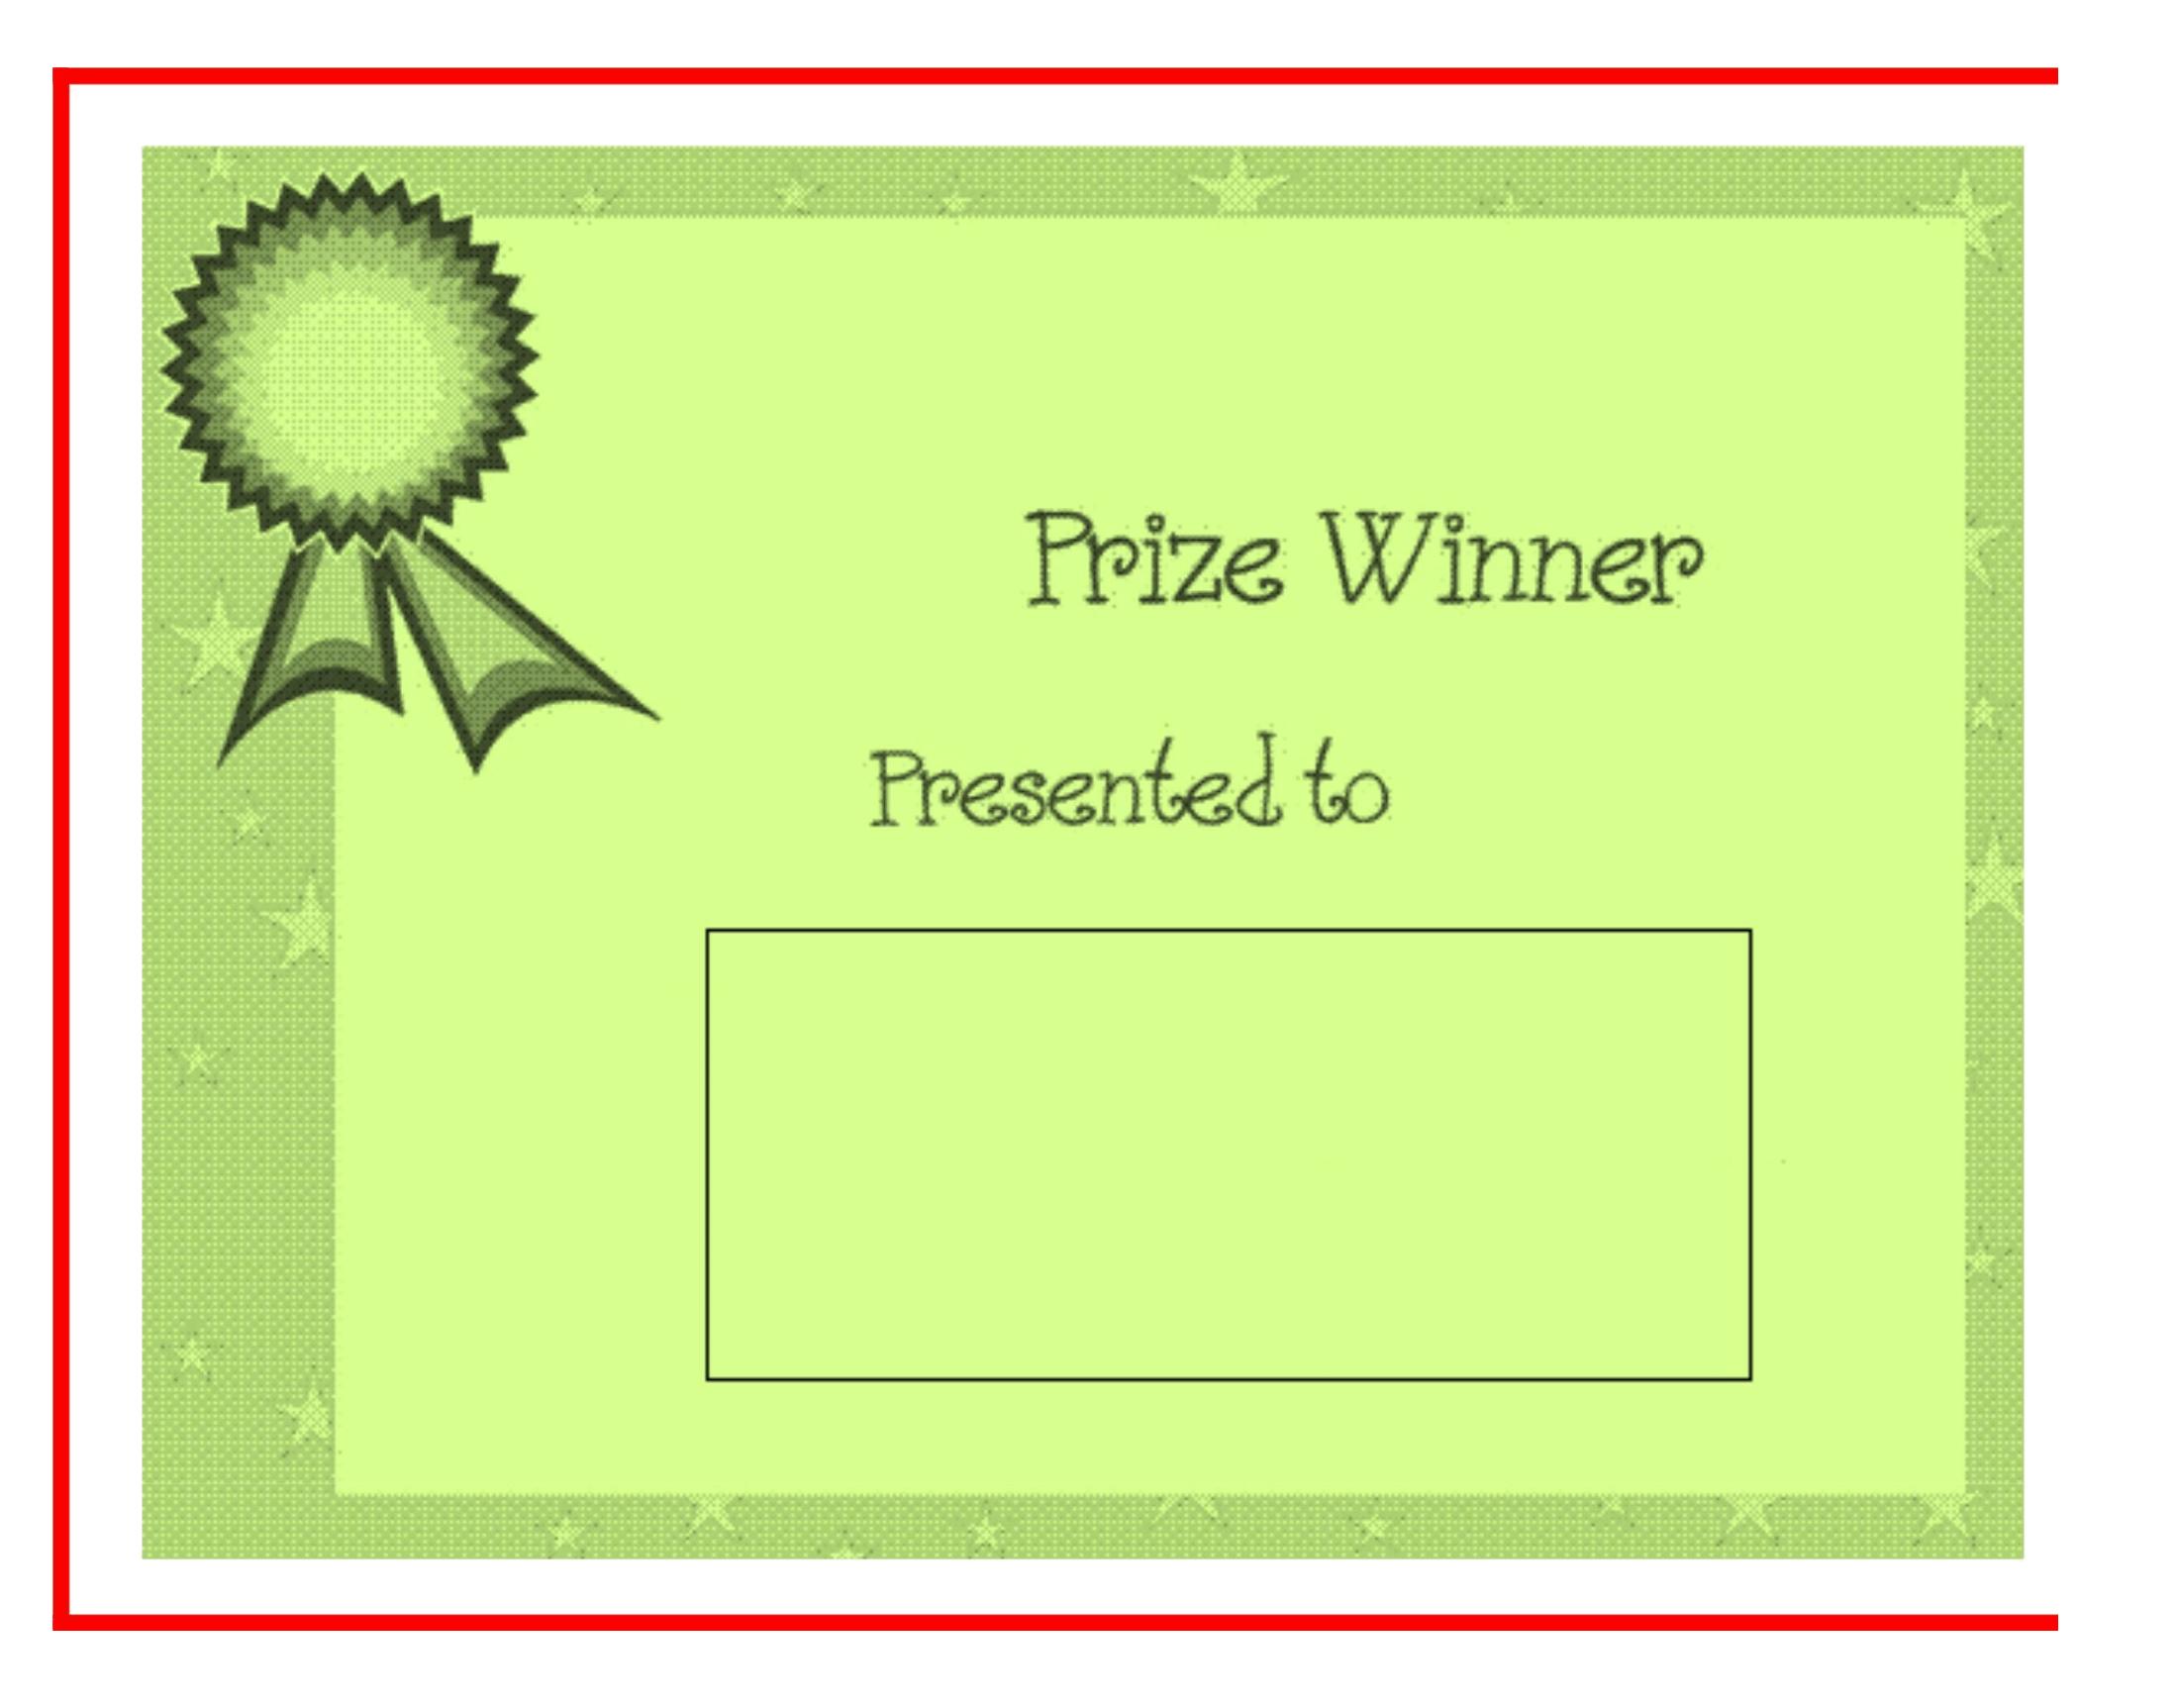 Prize Winner Certificate – FREE Download Template